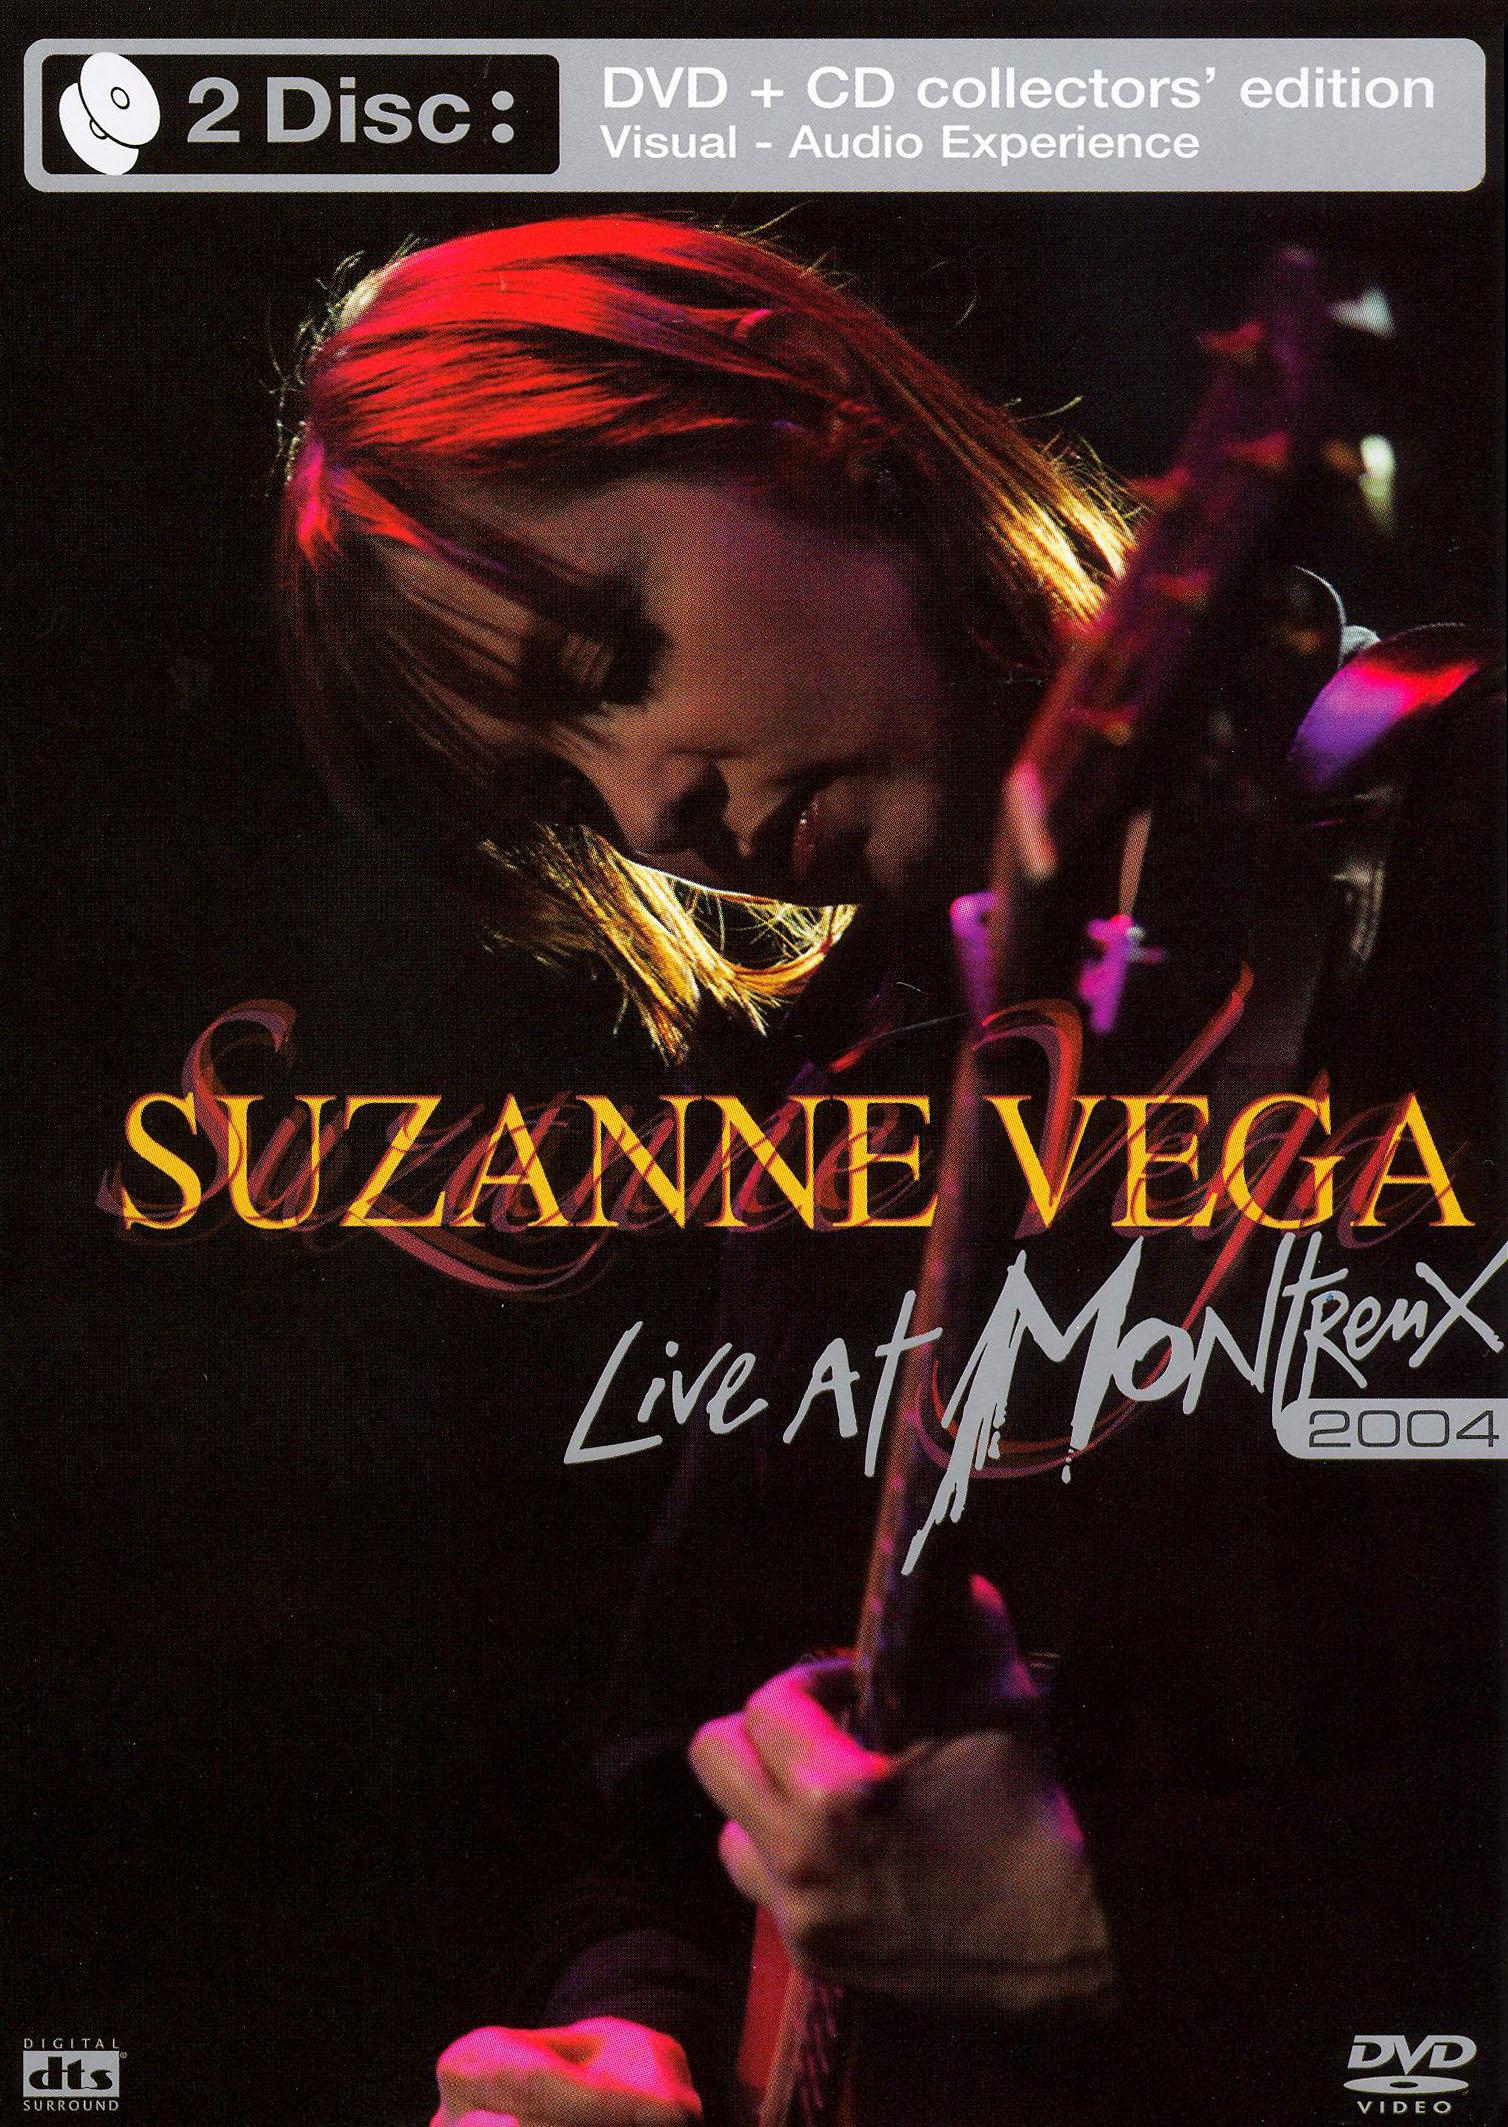 Suzanne Vega: Live at Montreux 2004